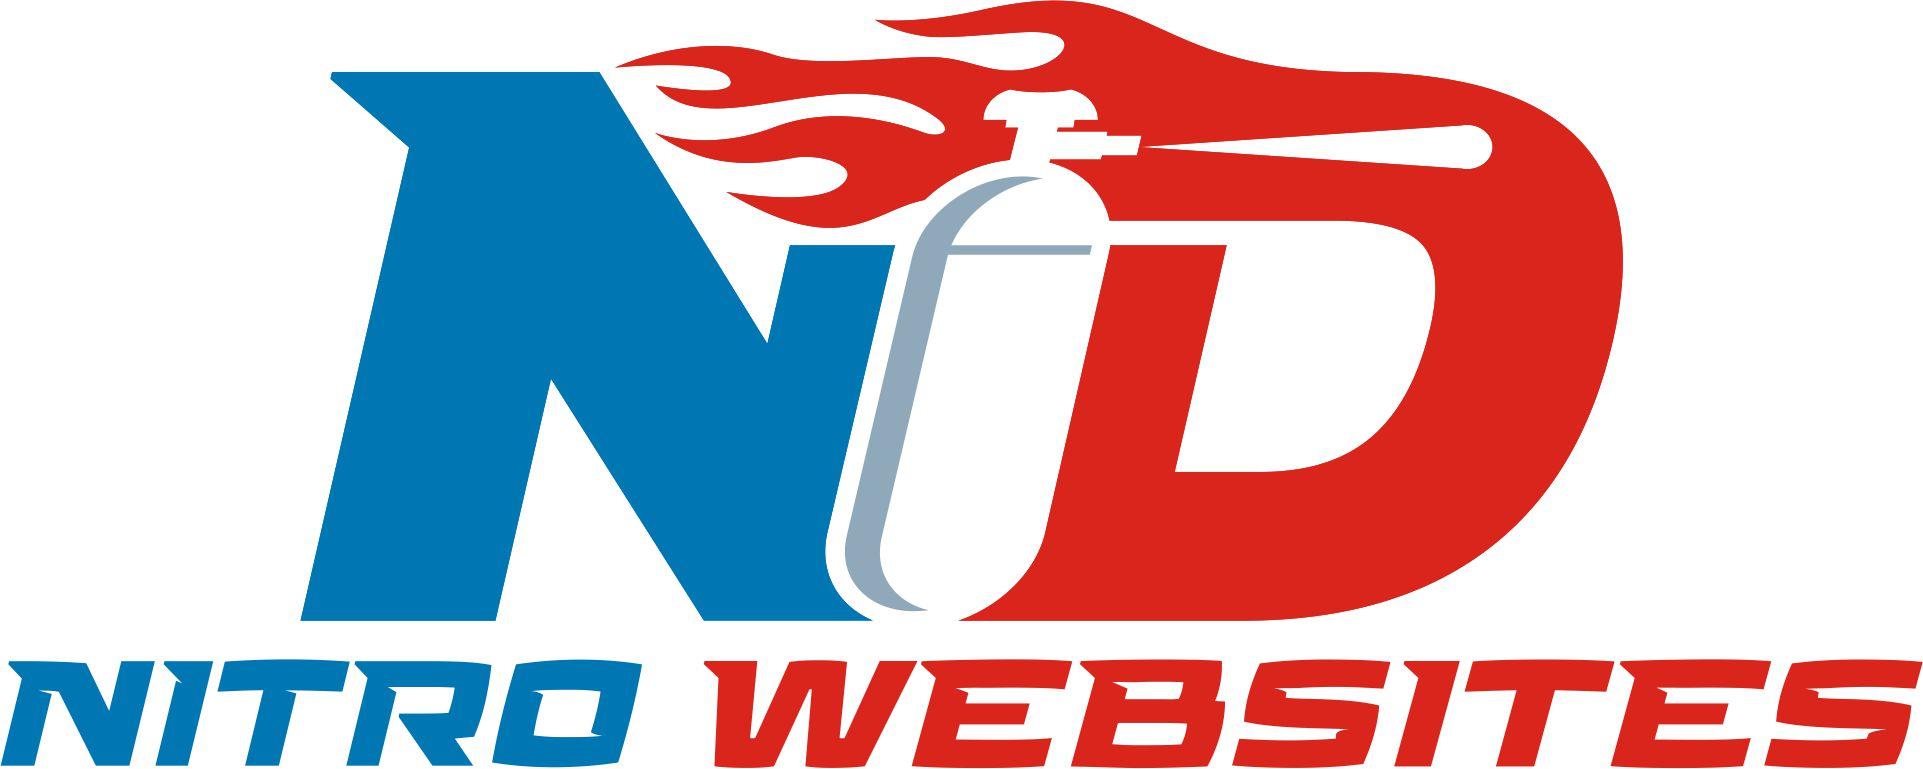 Nitro Websites - Web Hosting Solutions Powered by Nitro Designs